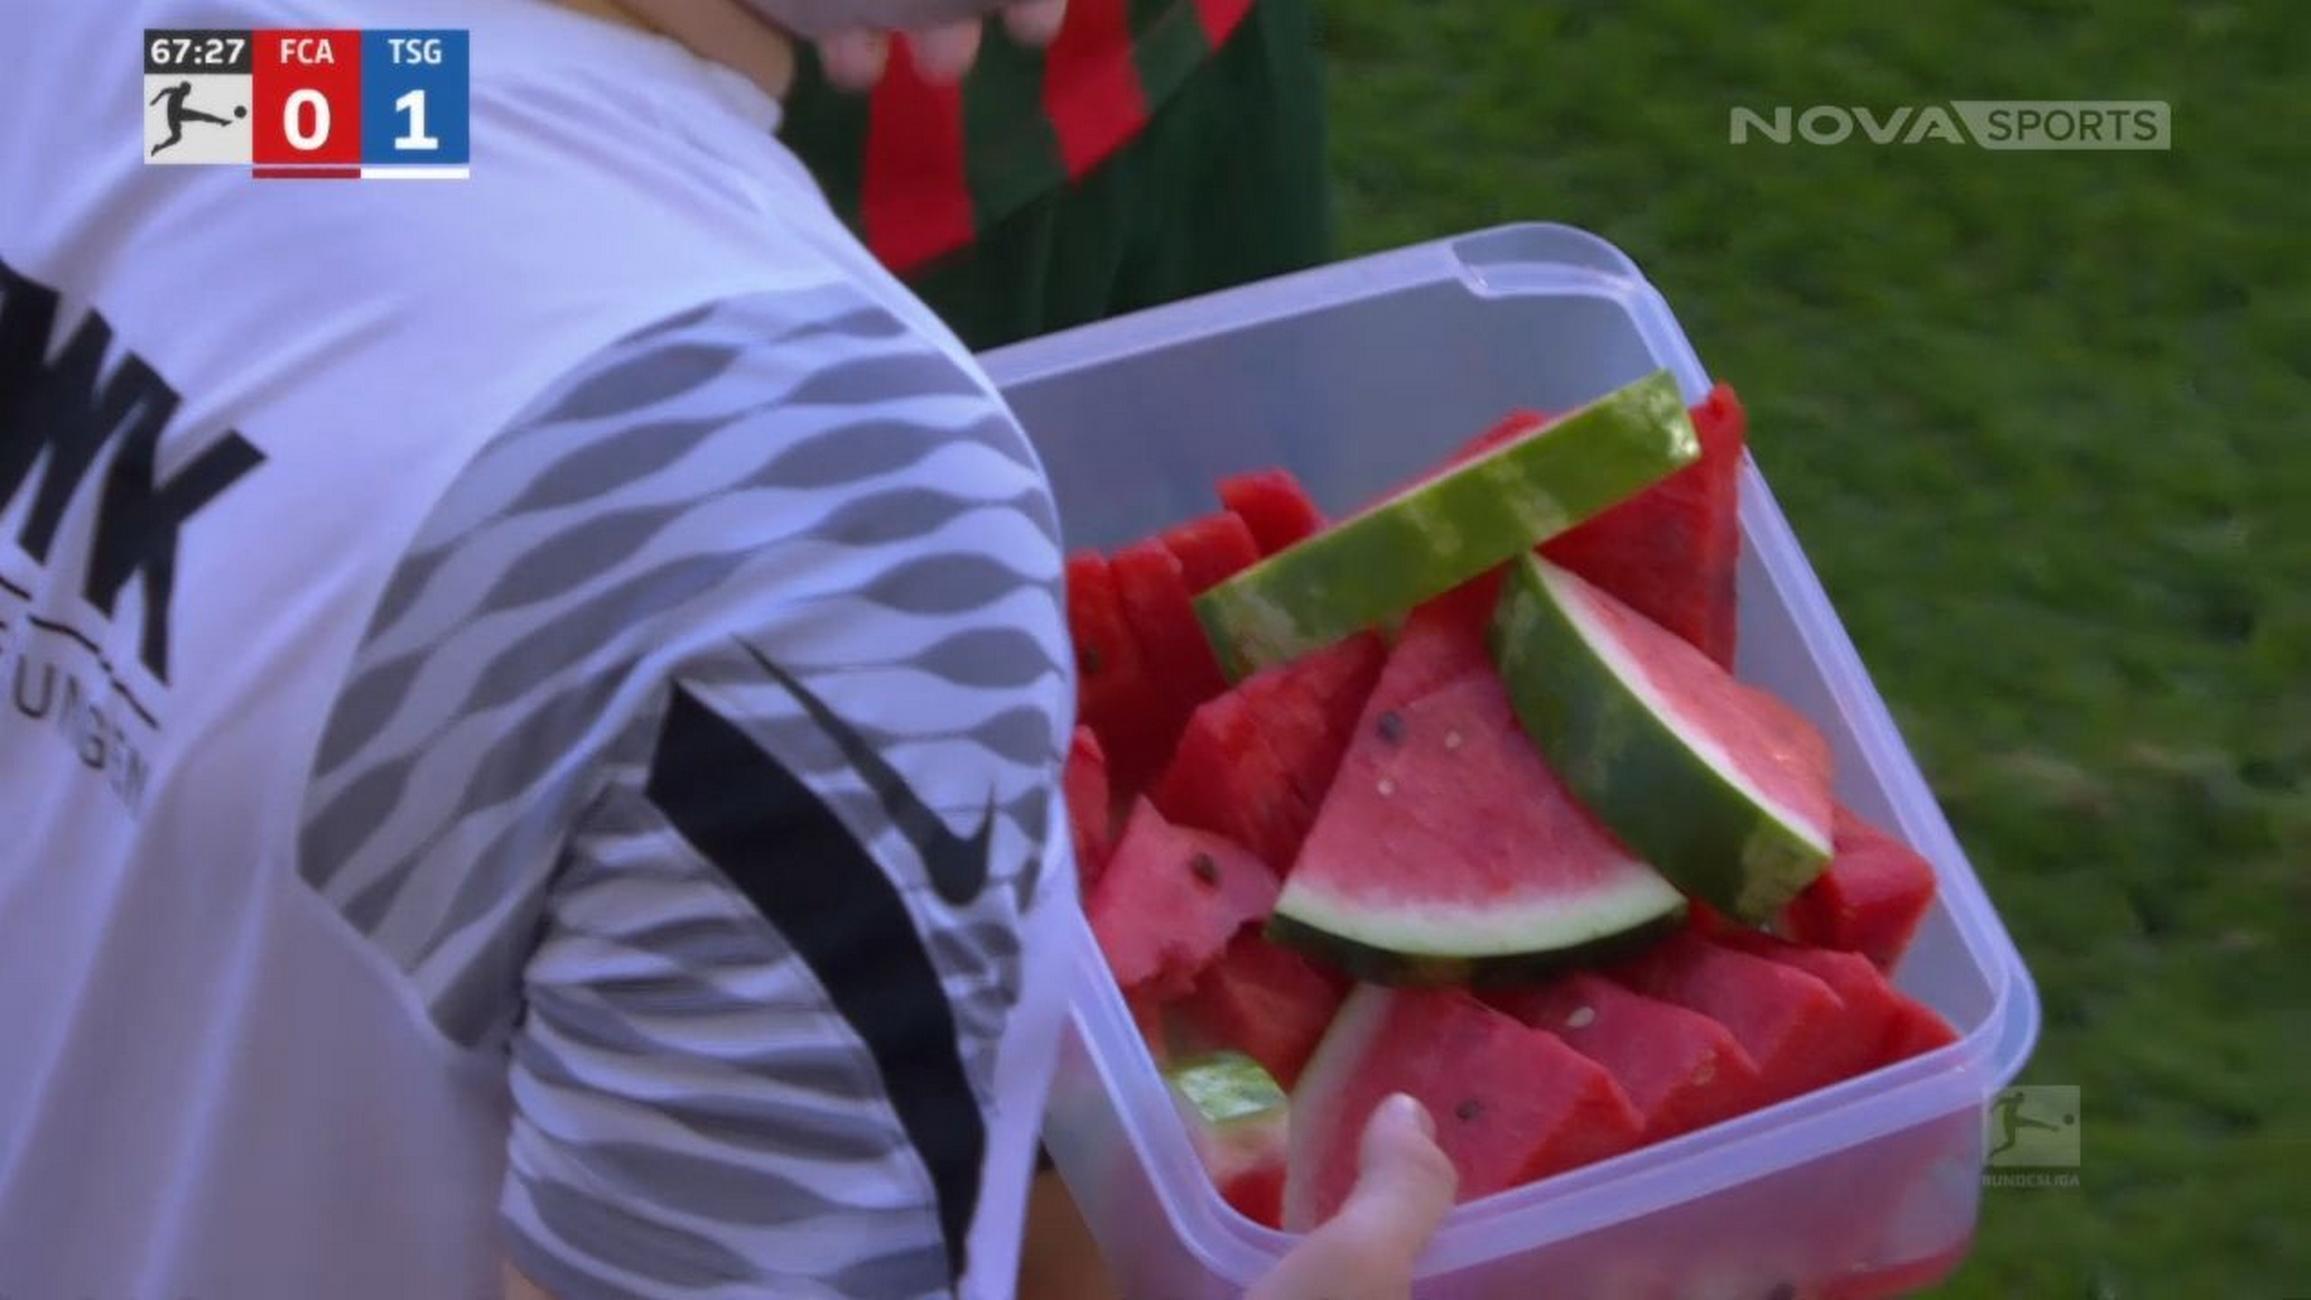 Bundesliga: Σταμάτησαν το παιχνίδι για να φάνε καρπούζι